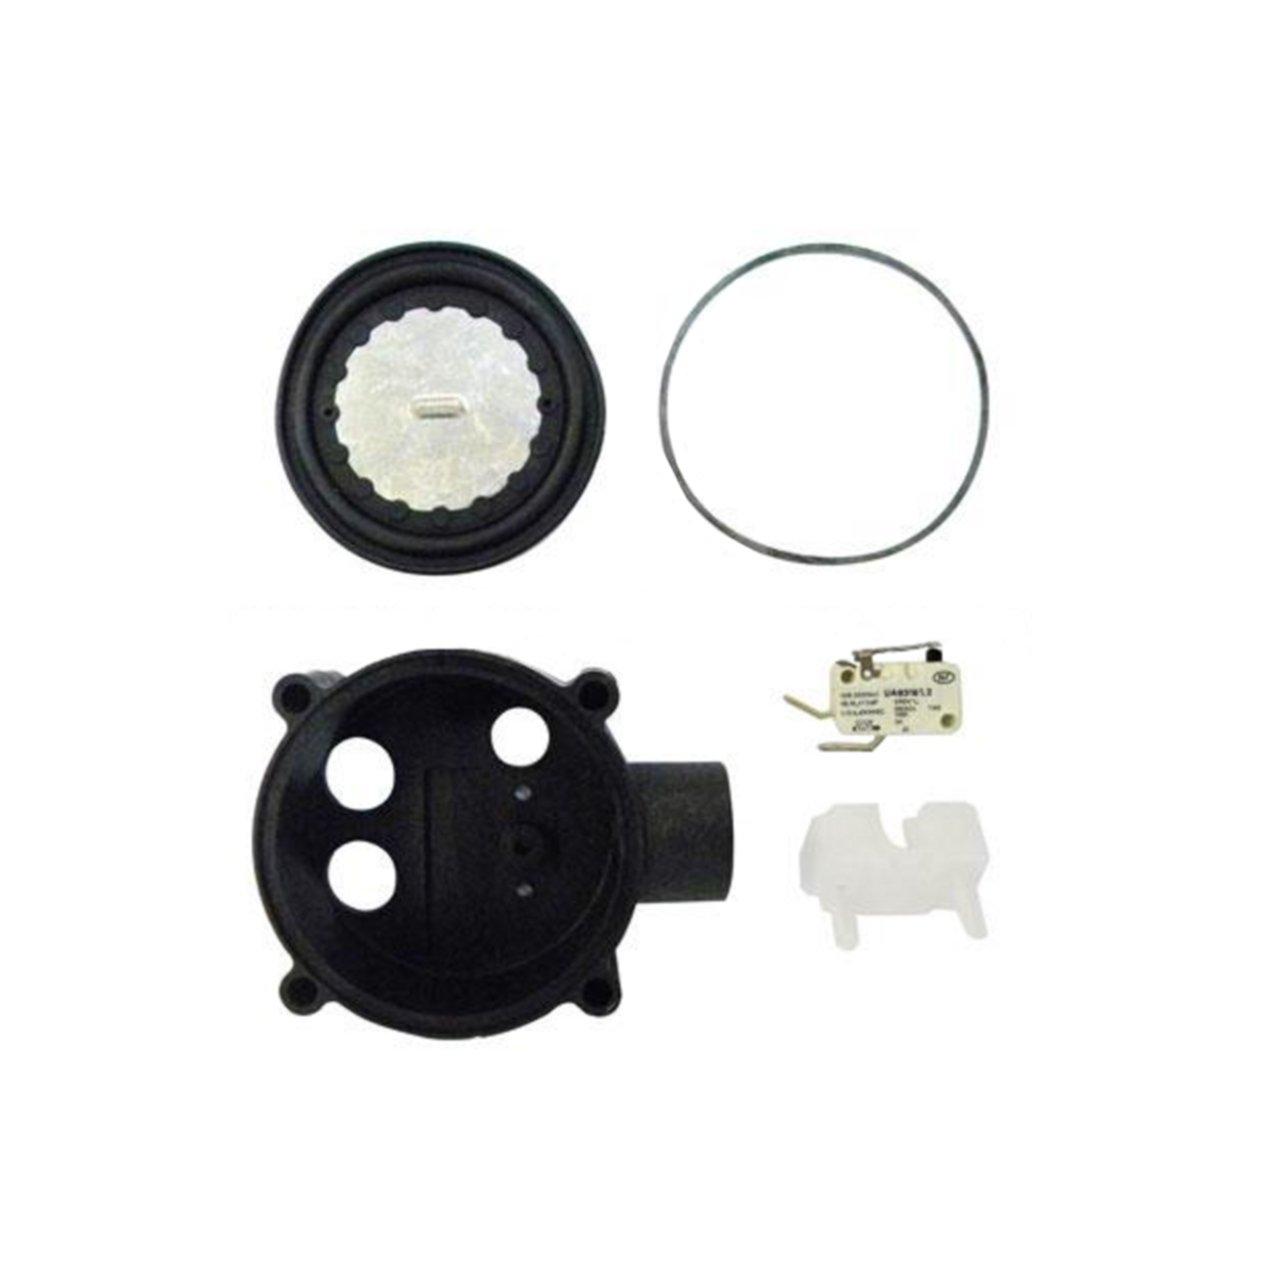 Amazon com  Little Giant 599310 SPRK 1 ML Sump Pump Switch Repair Kit  Home  ImprovementAmazon com  Little Giant 599310 SPRK 1 ML Sump Pump Switch Repair  . Outdoor Sump Pump Kit. Home Design Ideas